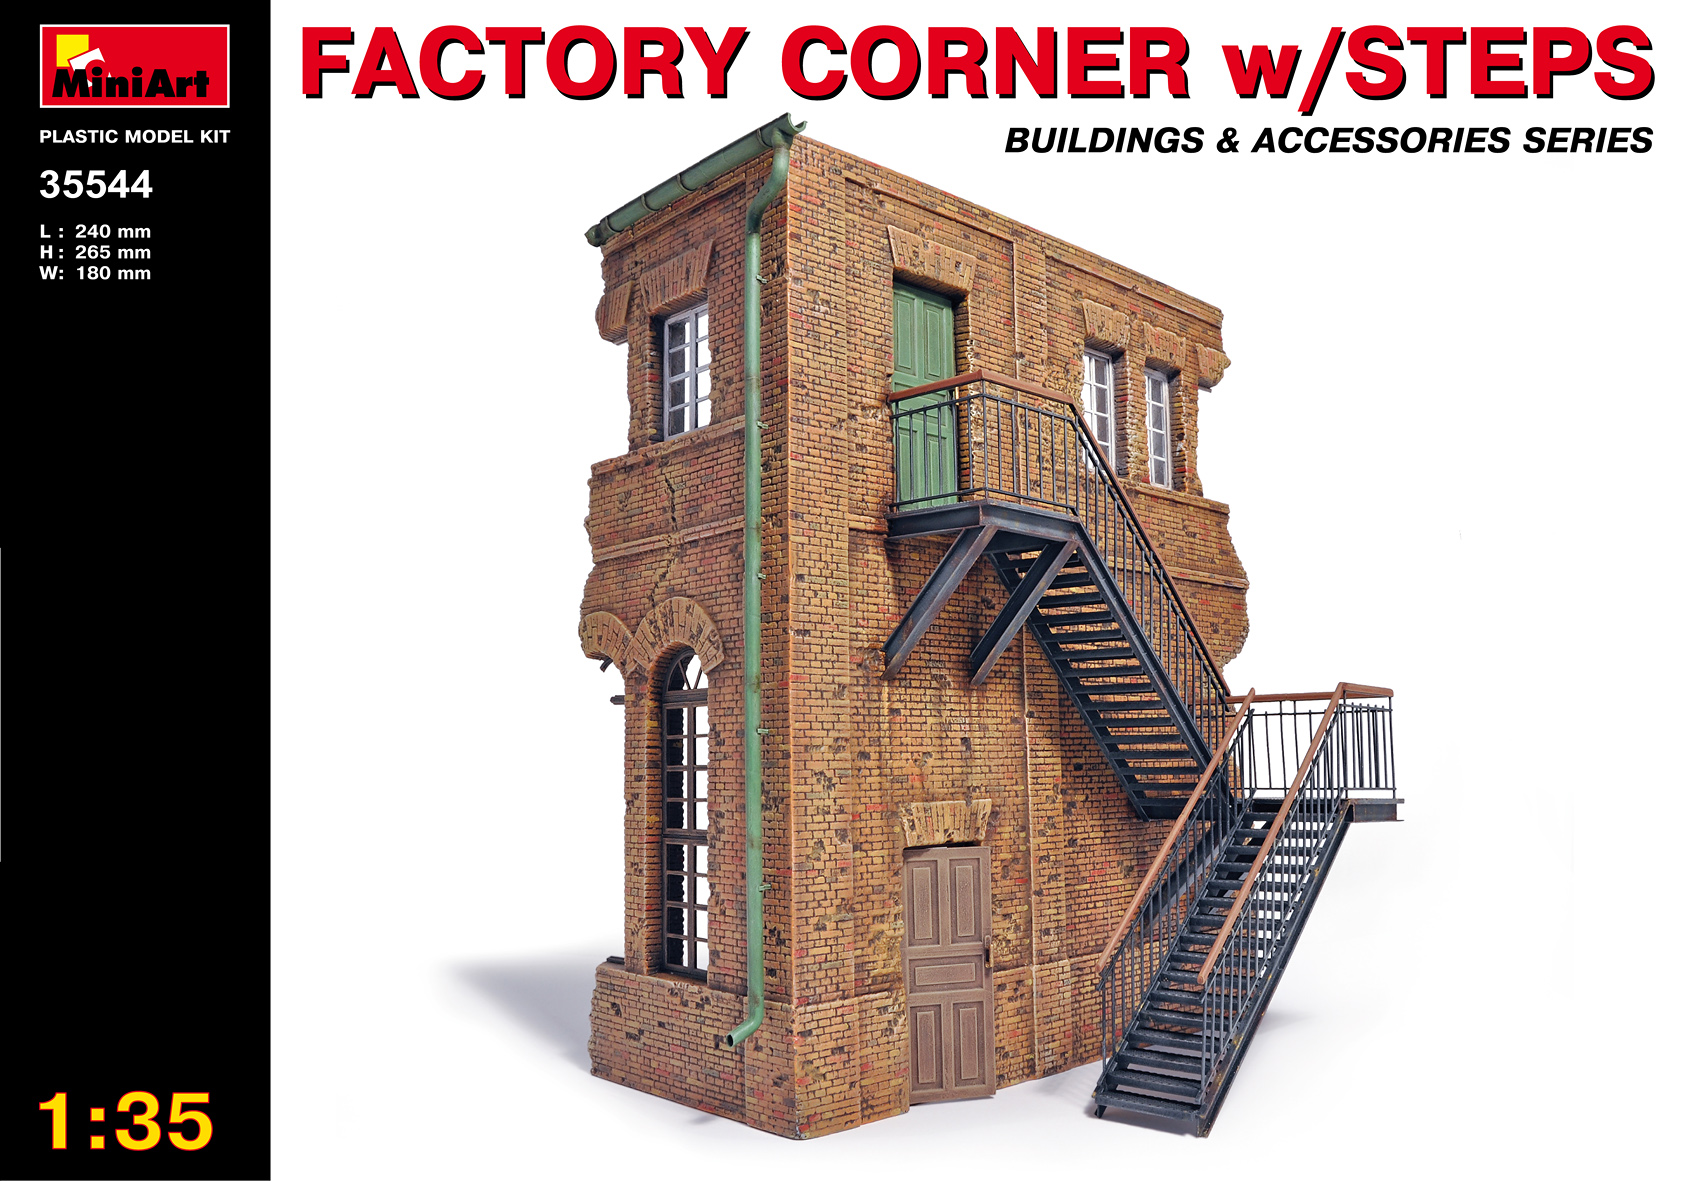 FACTORY CORNER w/ STEPS